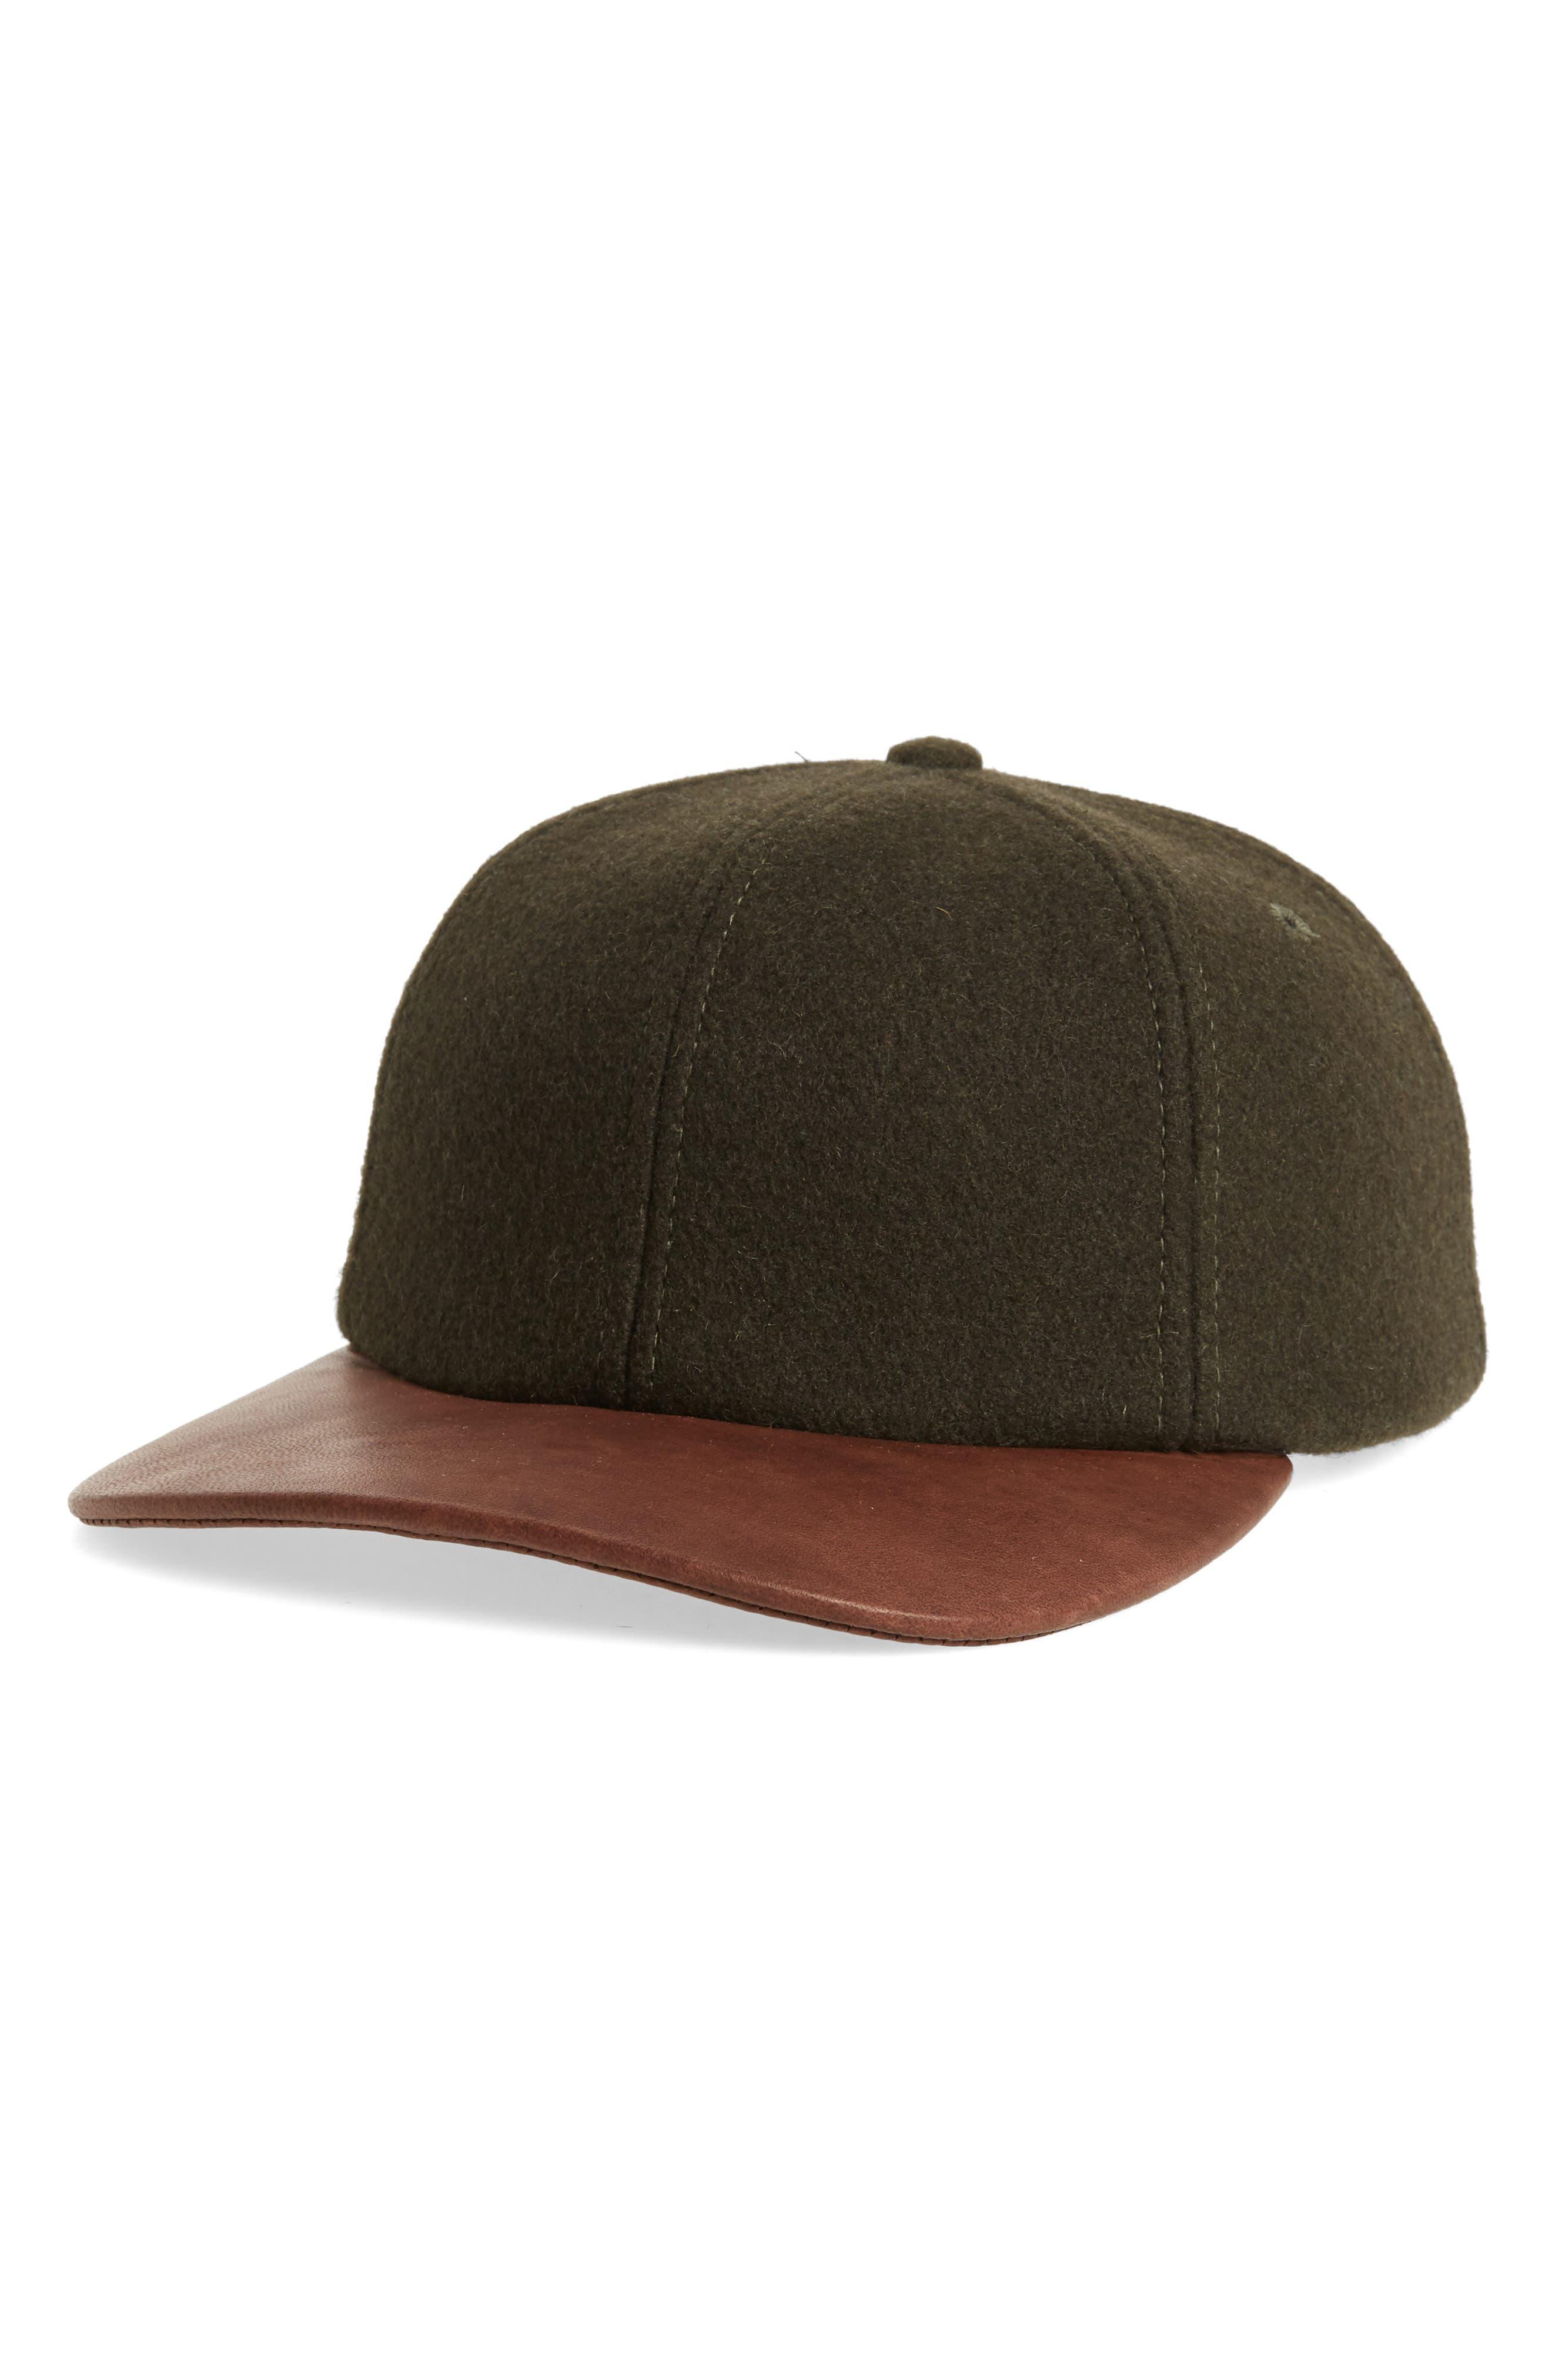 Melton Wool Blend Baseball Cap,                             Main thumbnail 1, color,                             LODEN